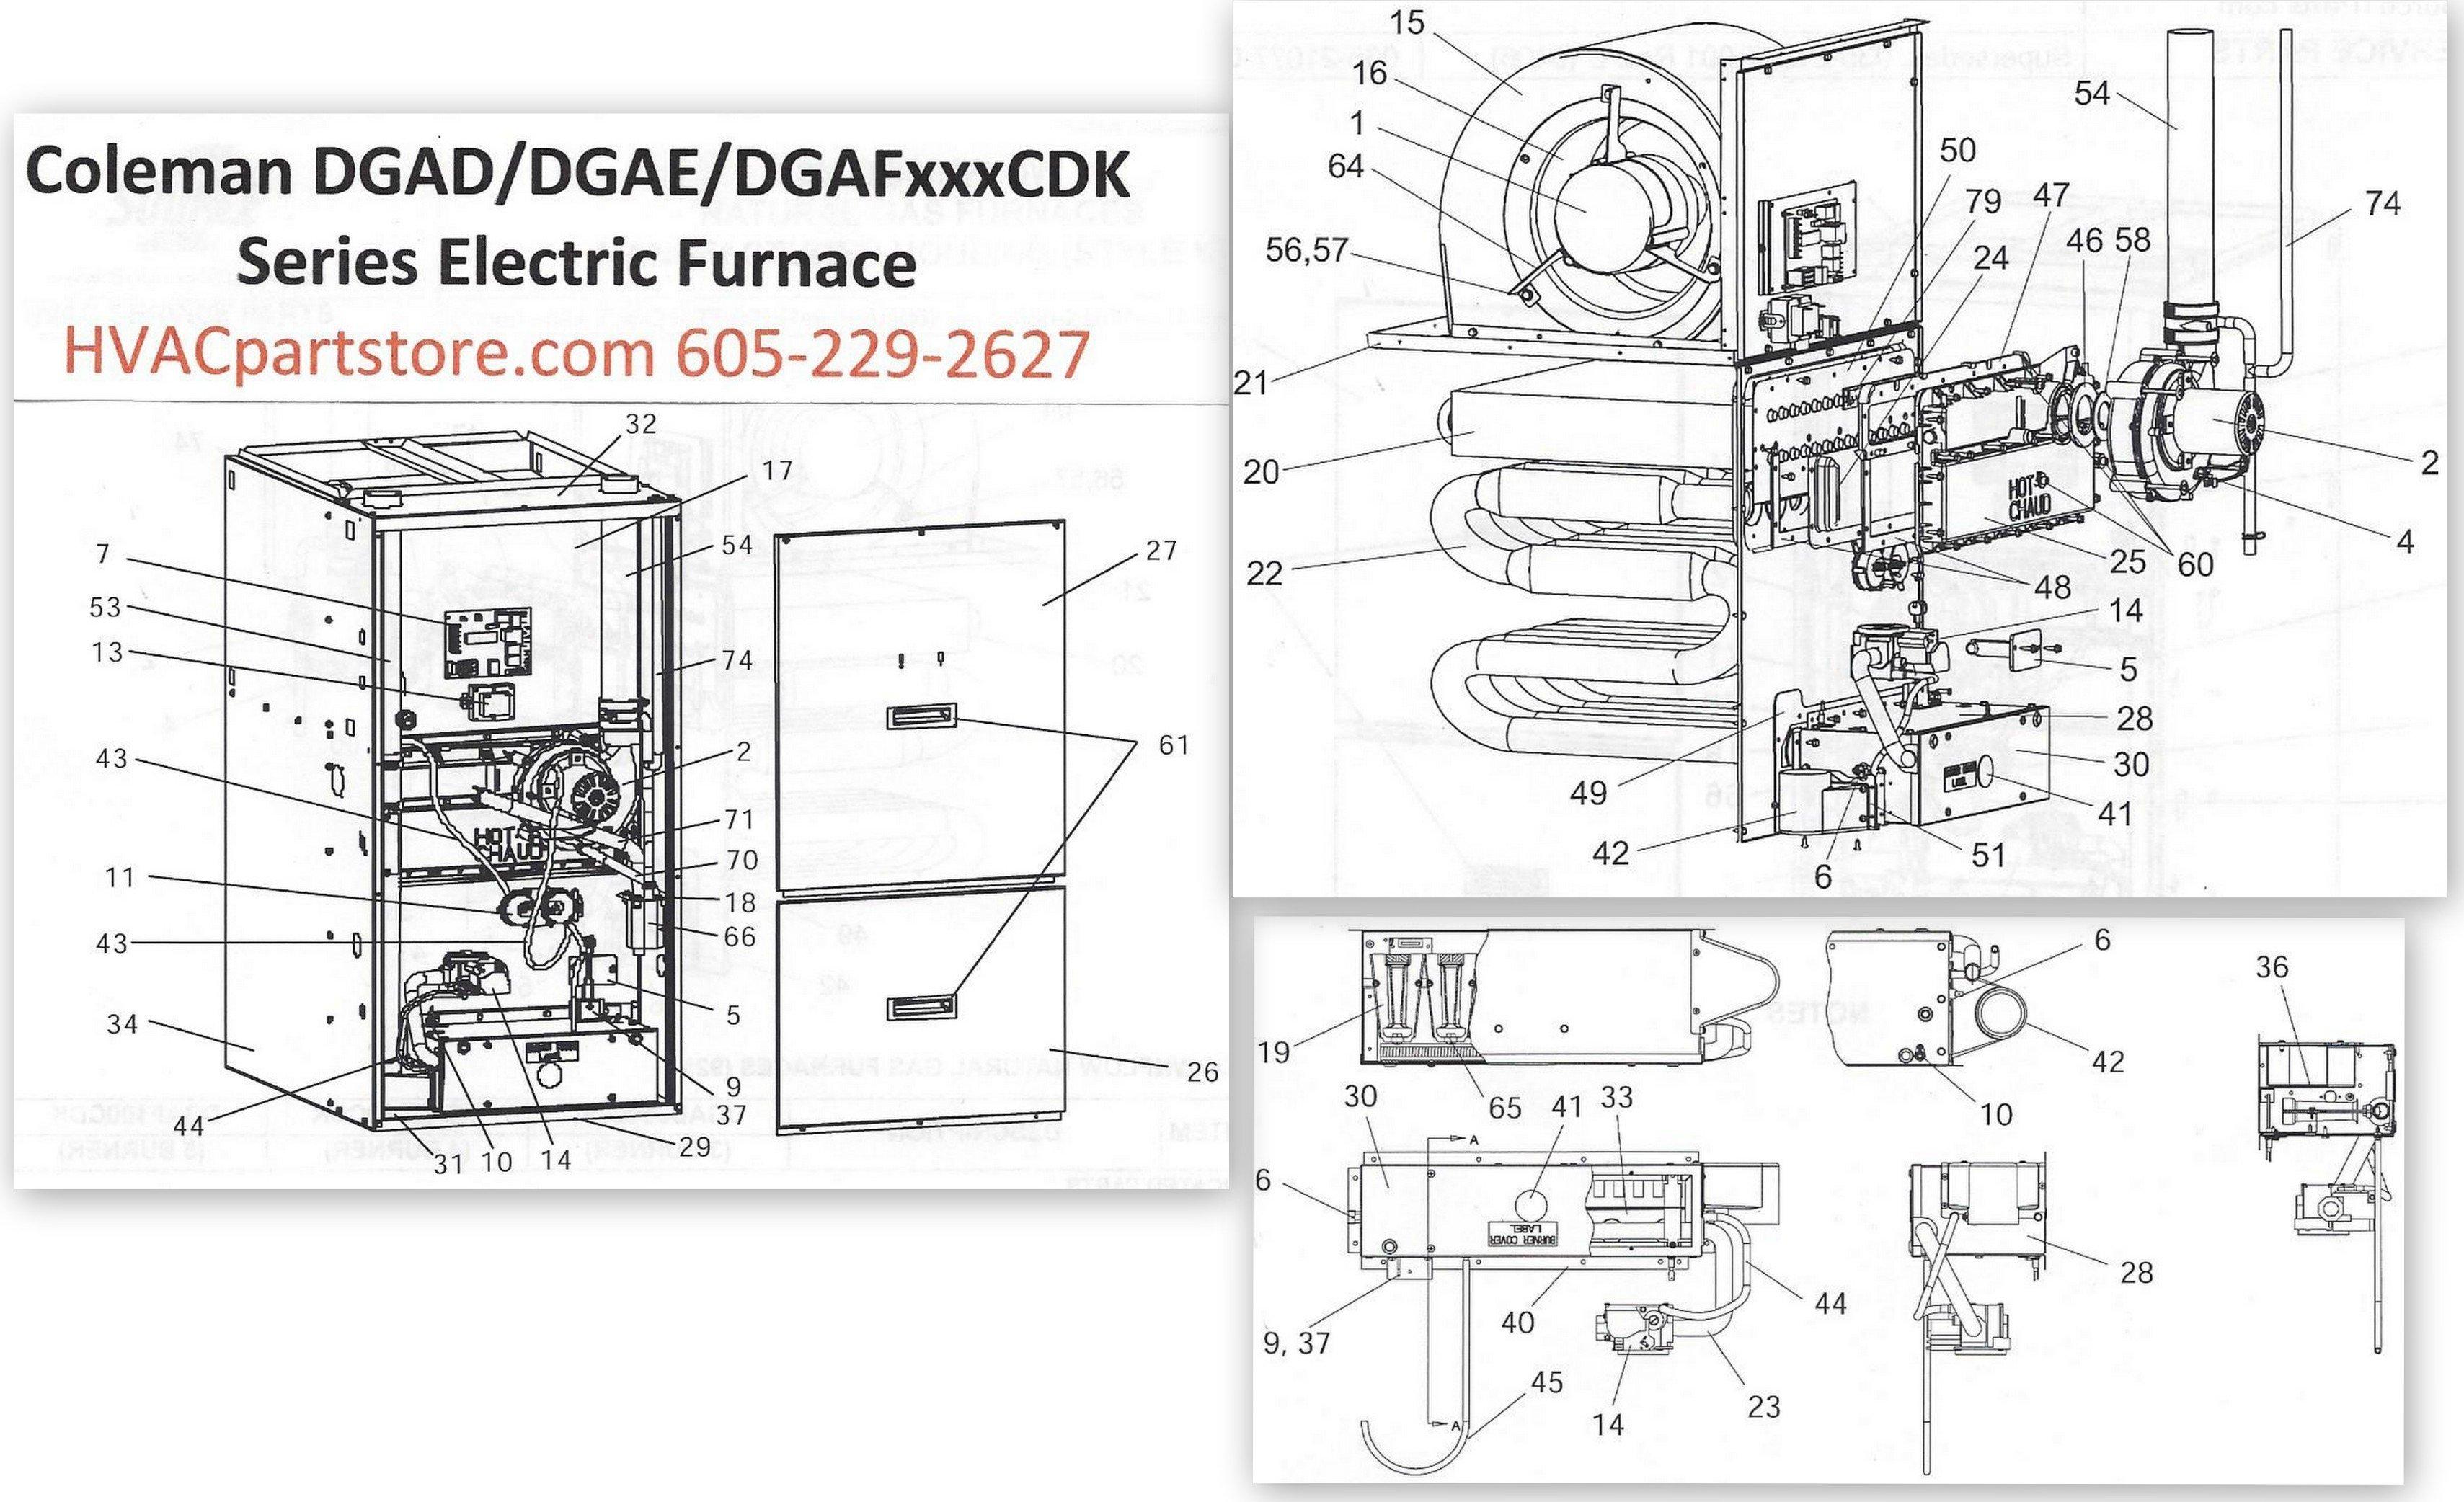 coleman wiring diagram zf 2028  propane coleman evcon furnace wiring schematic download  coleman evcon furnace wiring schematic